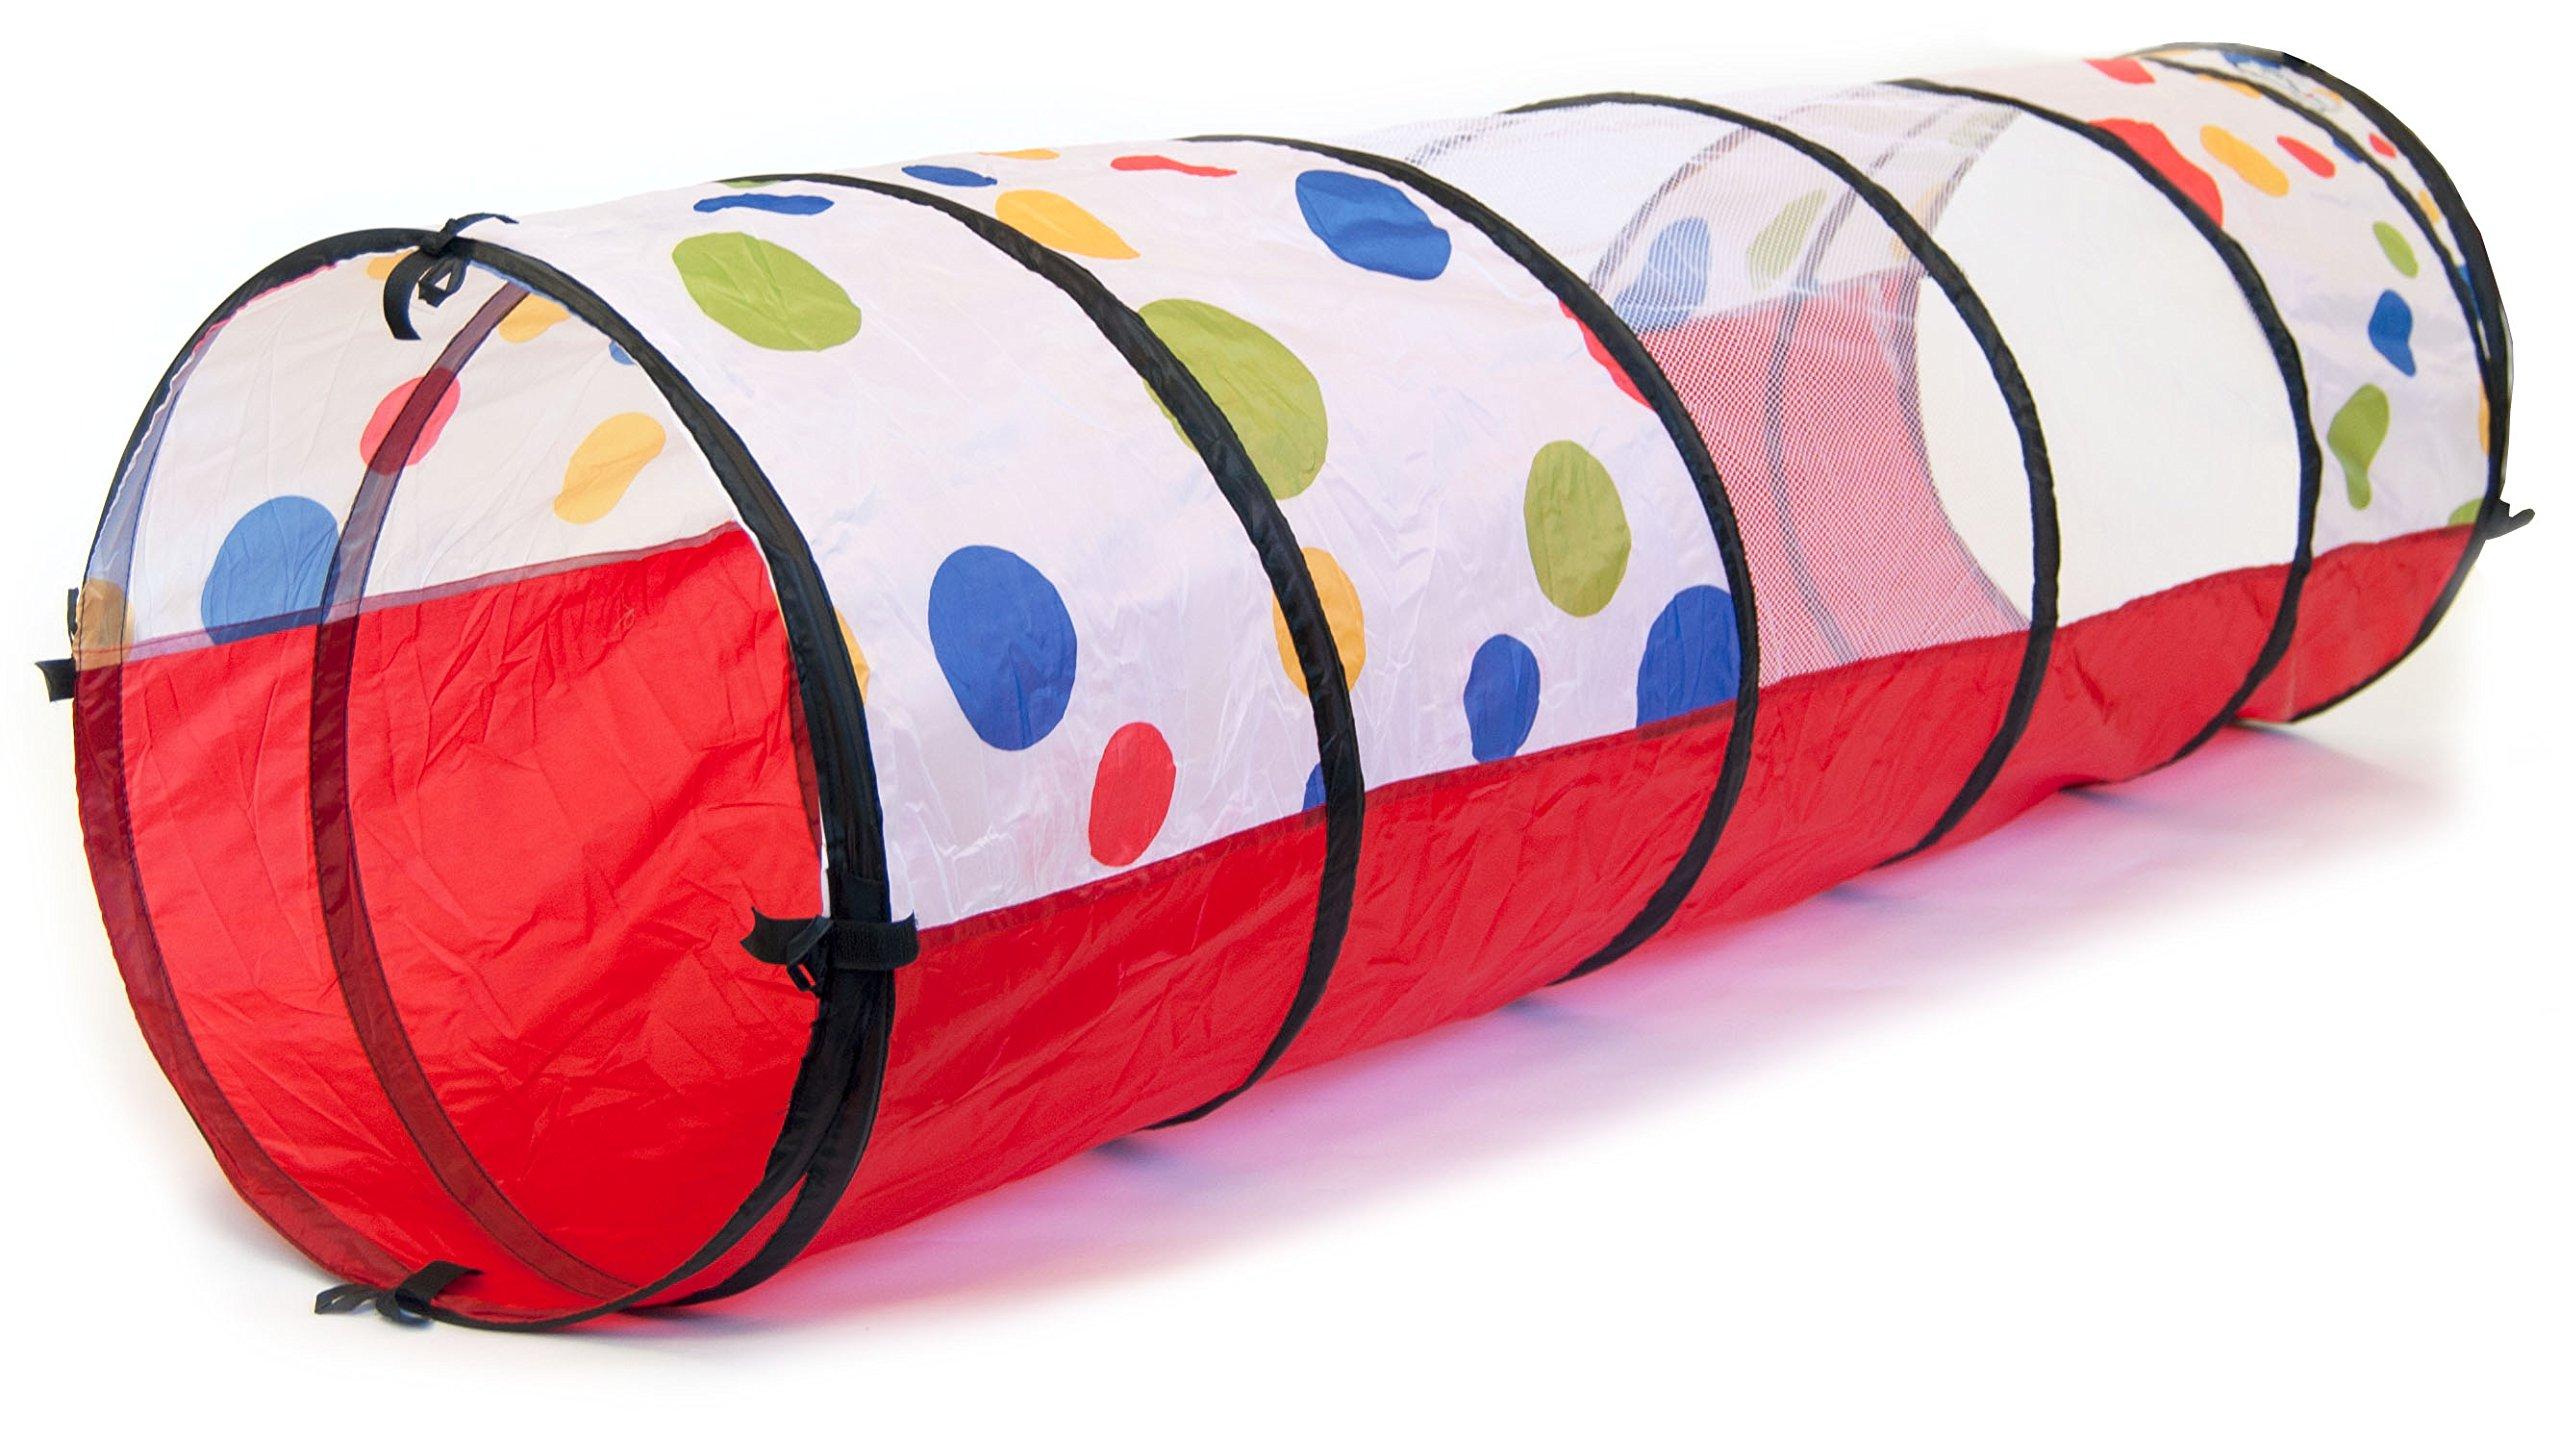 eWonderWorld Jumbo Polka Dot Development Crawl Play Tunnel Safety Meshing & Tote Bag, 20'' x 69''